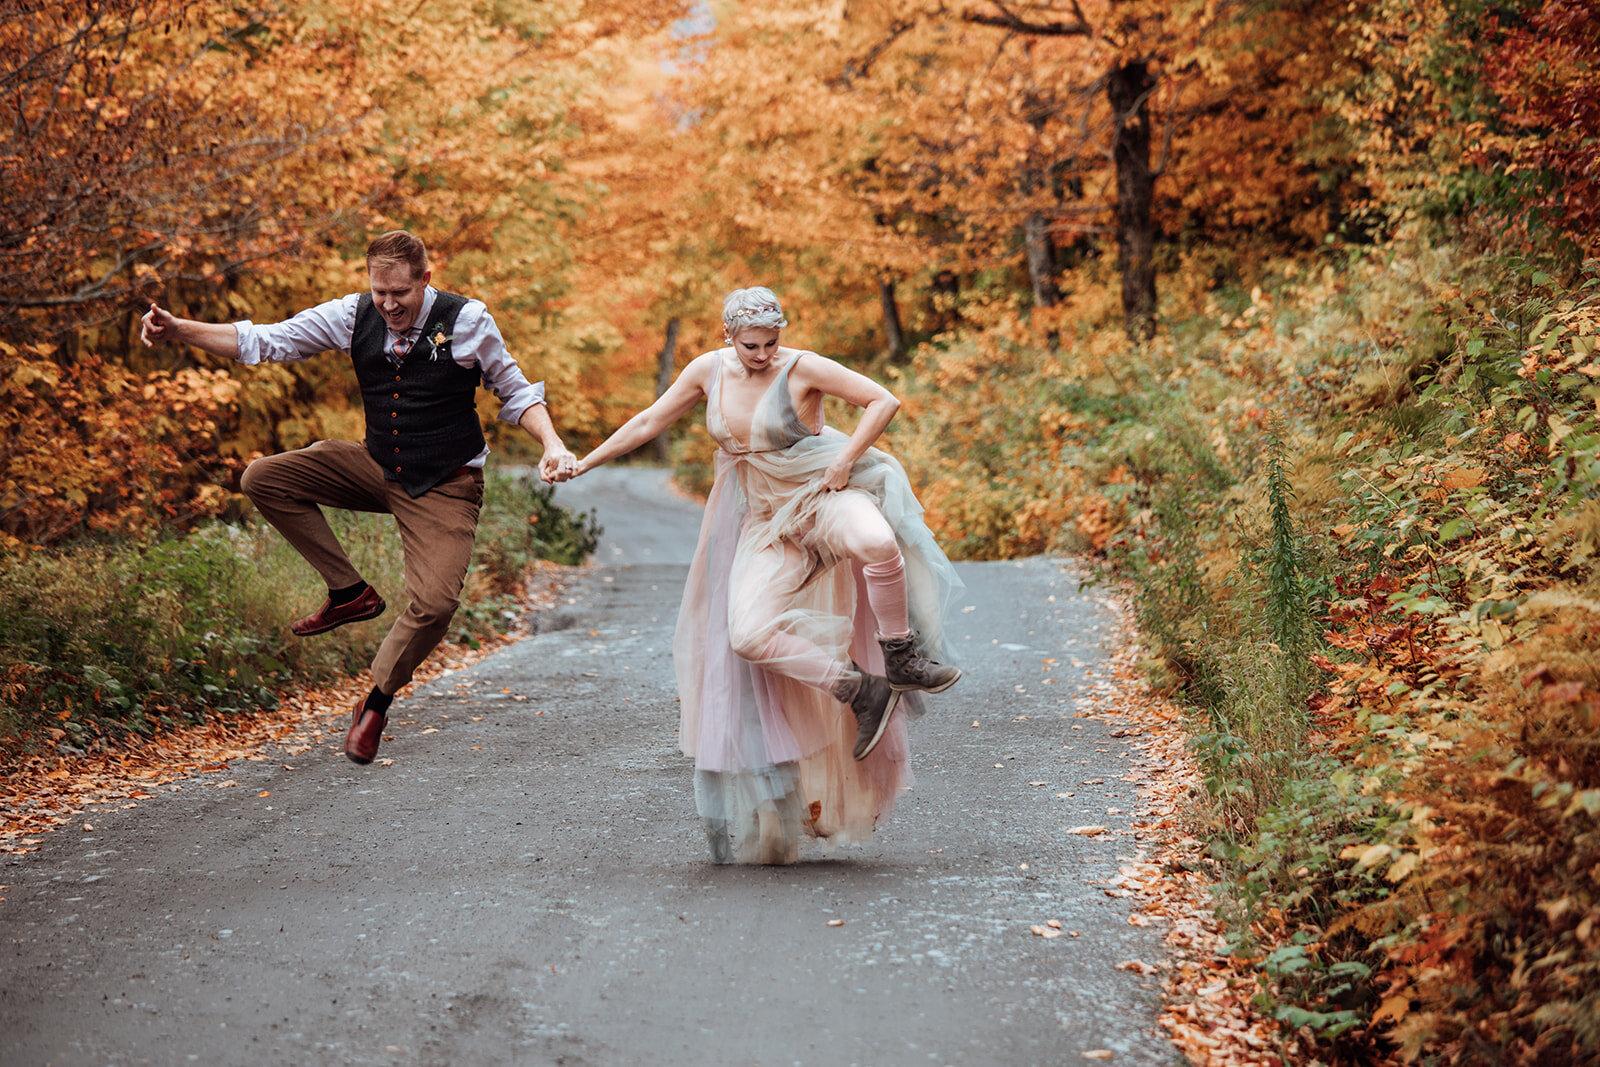 vermont-elopement-wedding-fall-foliage